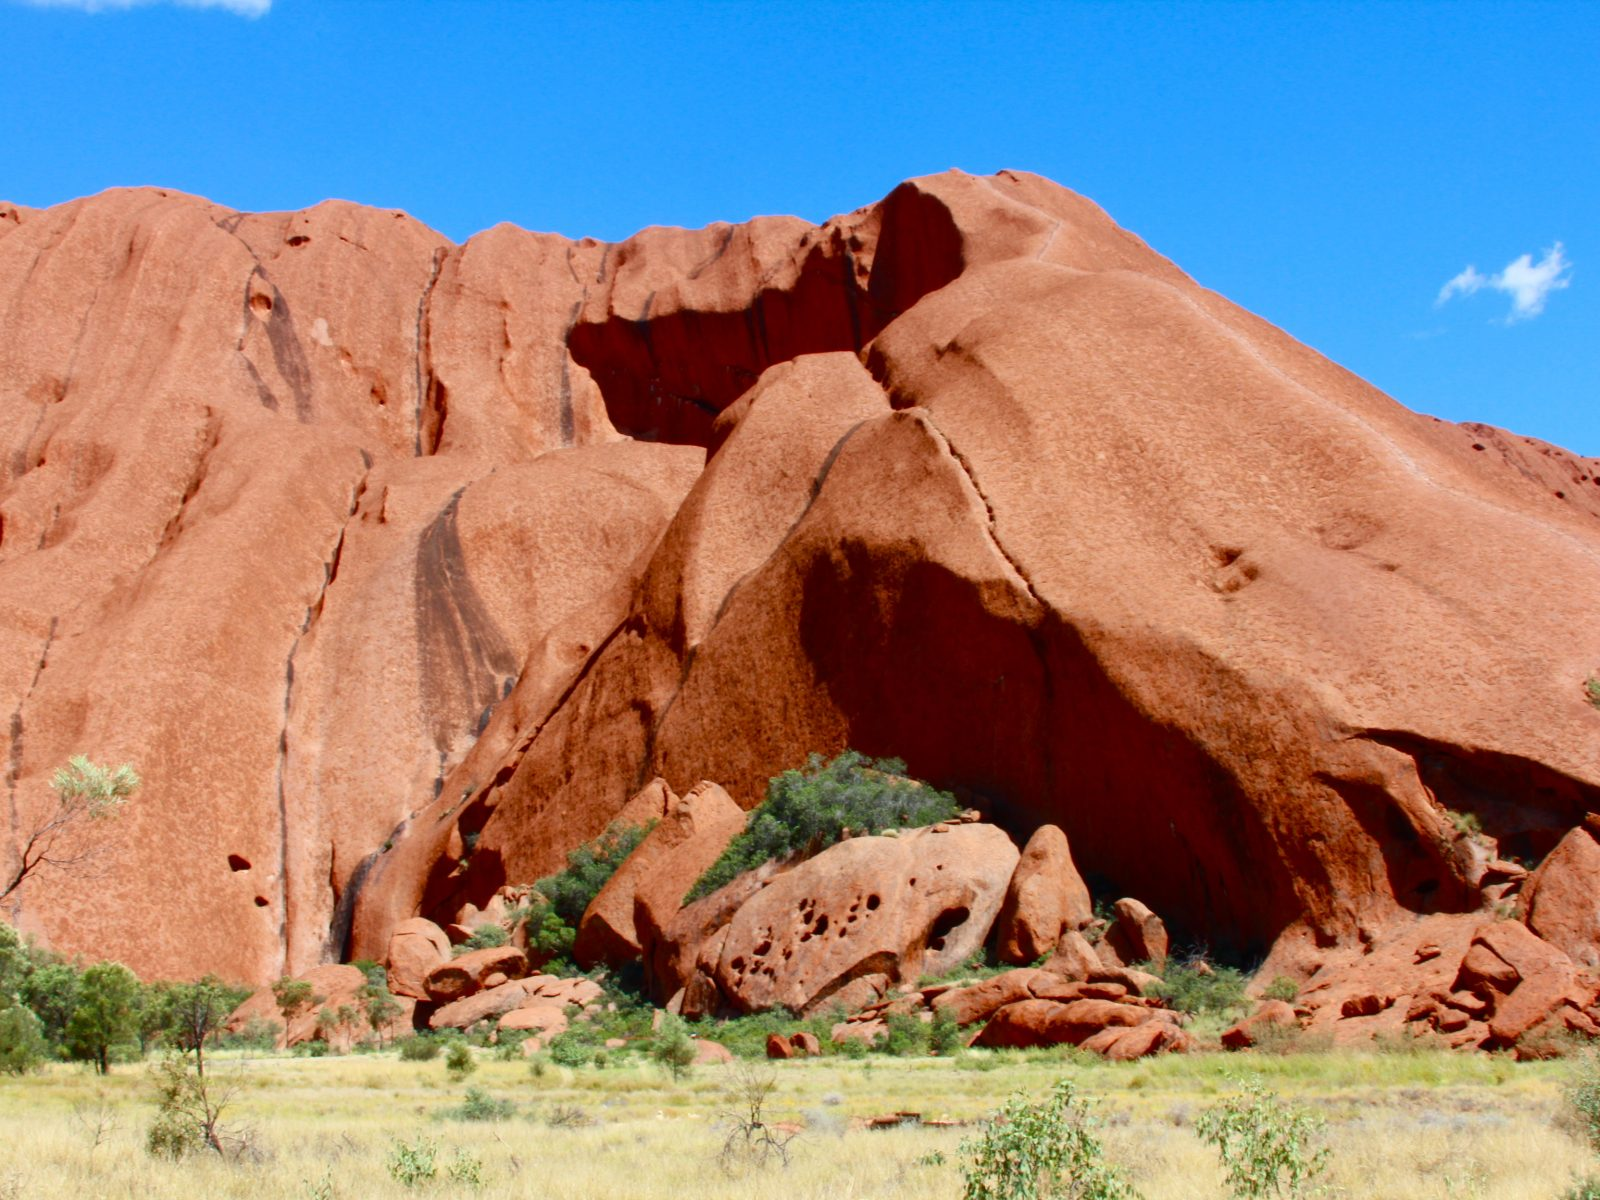 Uluru (Ayers Rock) crevices